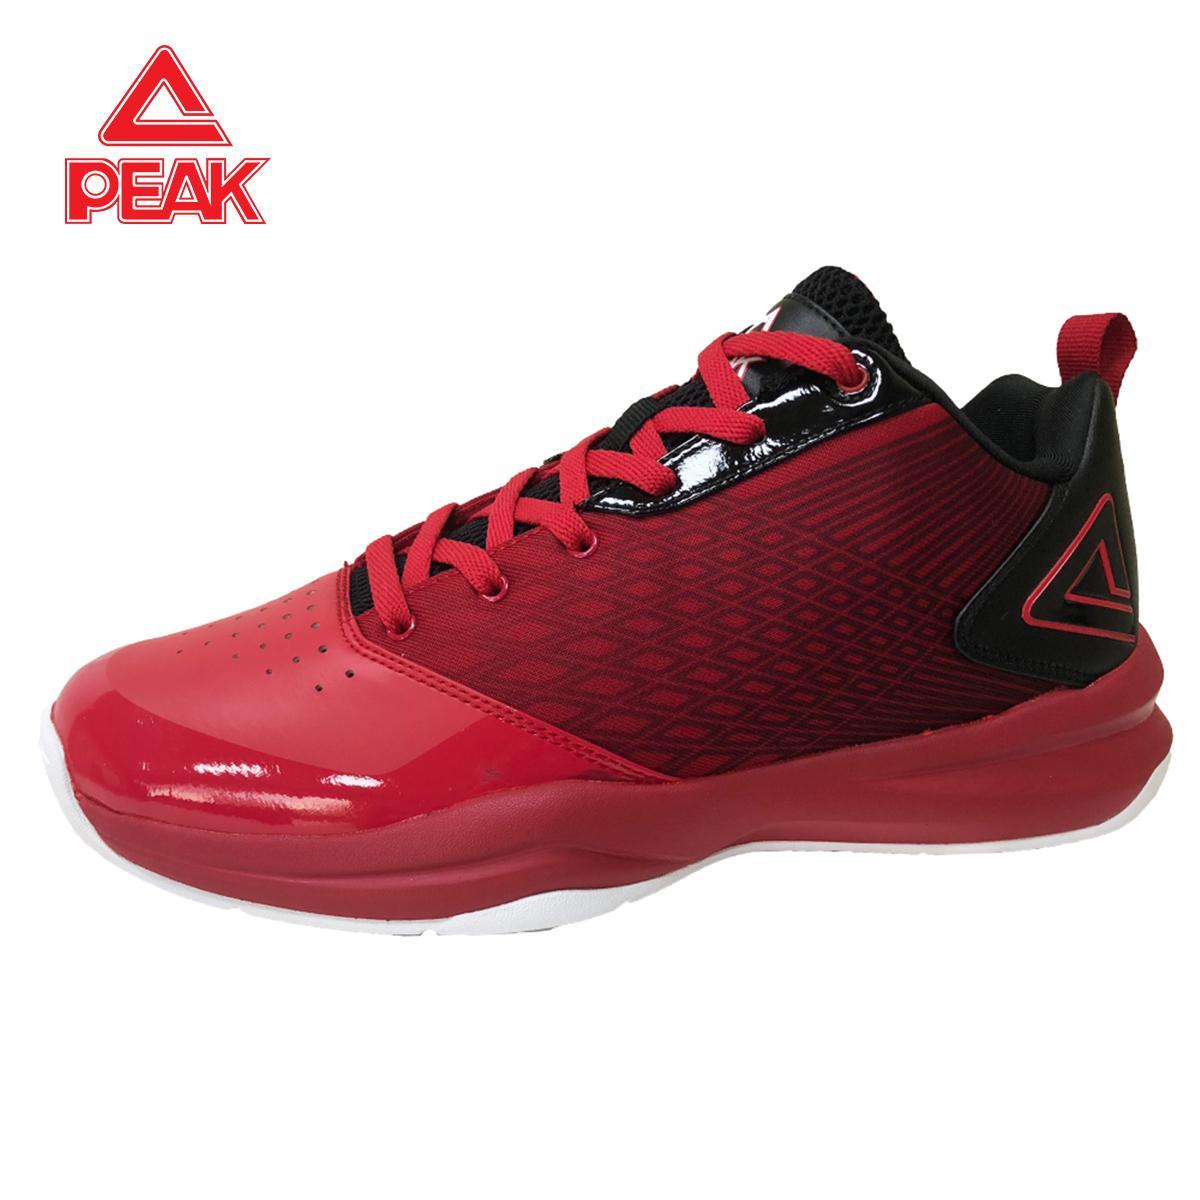 970bb6b909218 Peak Men's Basketball Shoes Terrence Romeo Rising Star (Dark Red/Black)  E62141ARB